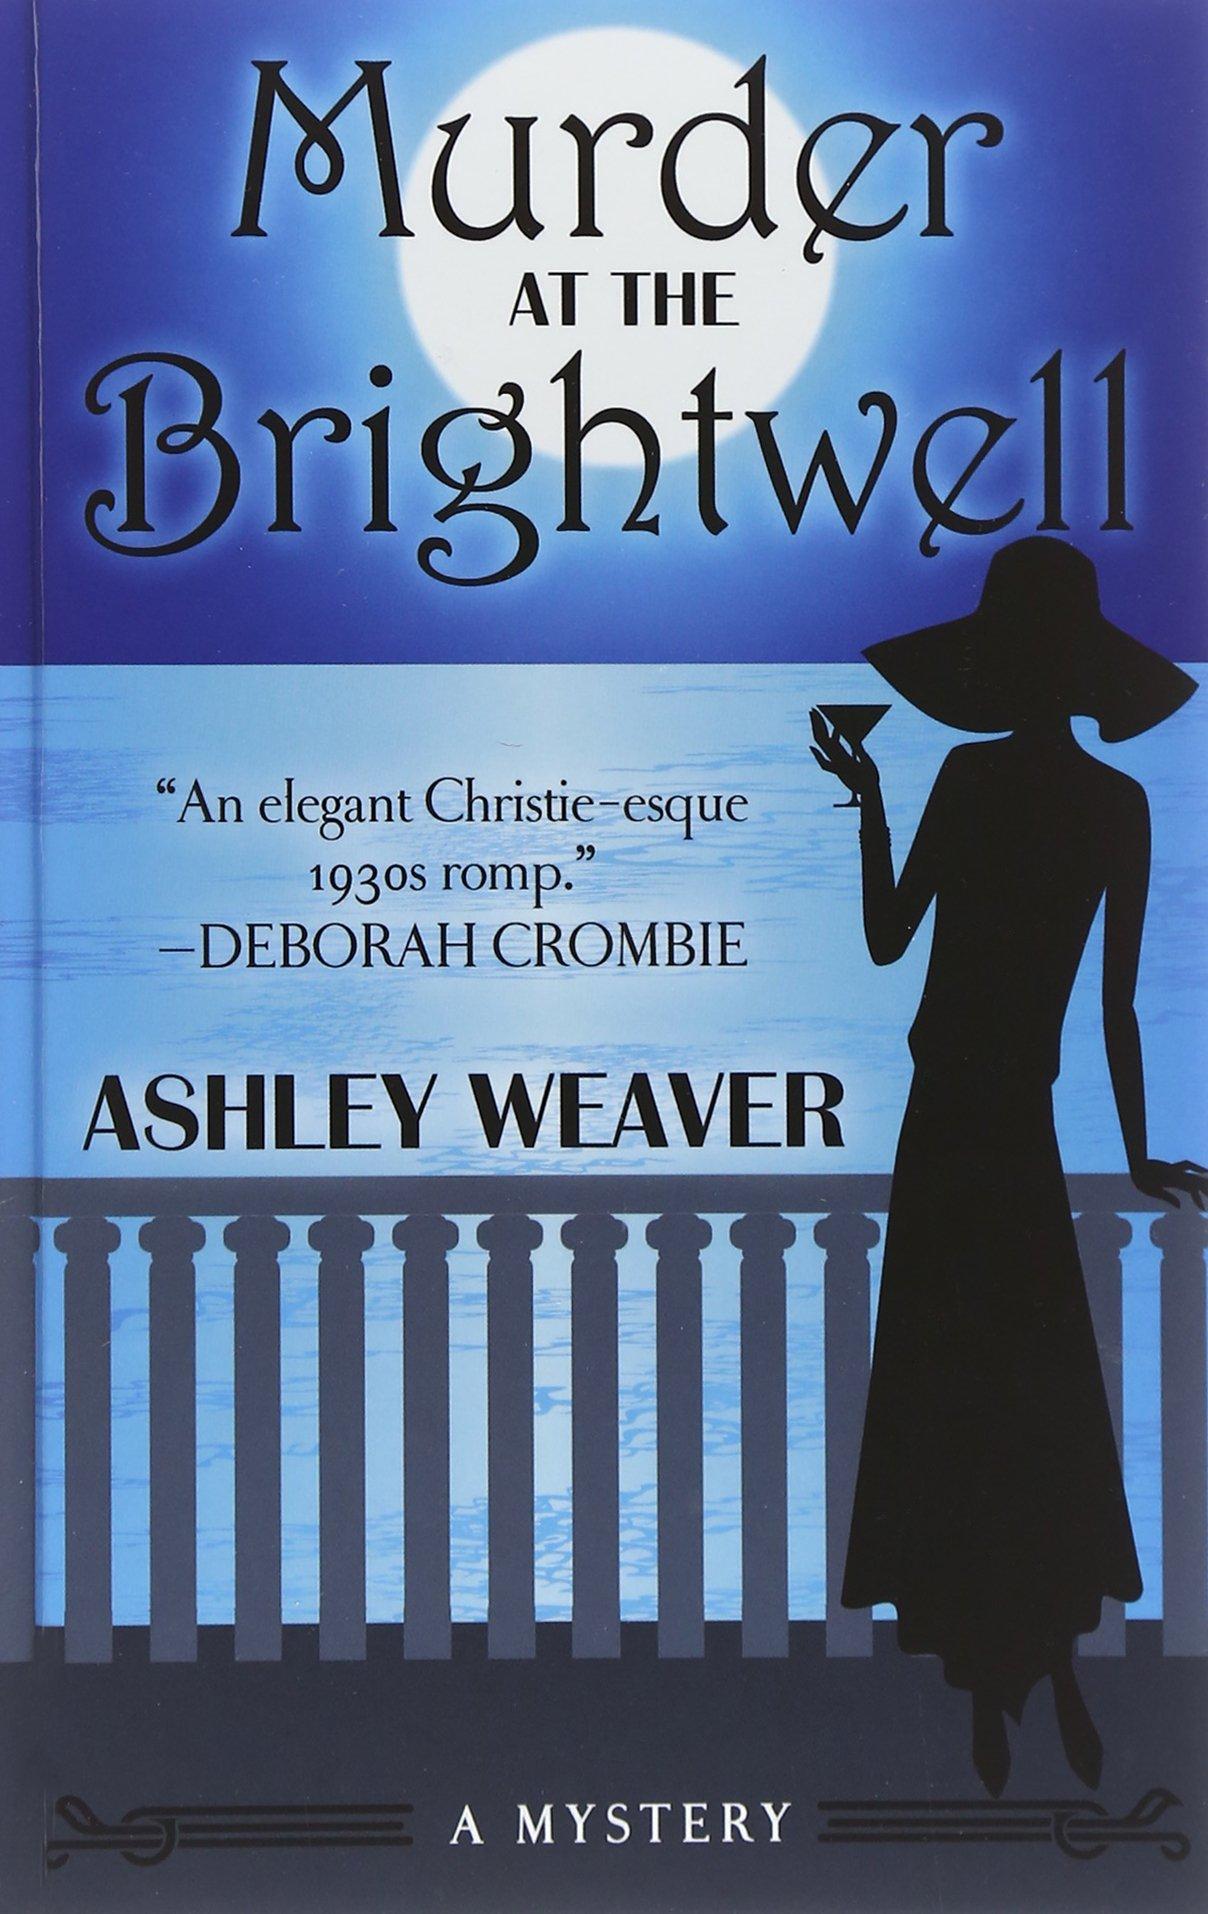 Murder At The Brightwell (Thorndike Press Large Print Mystery) ePub fb2 ebook